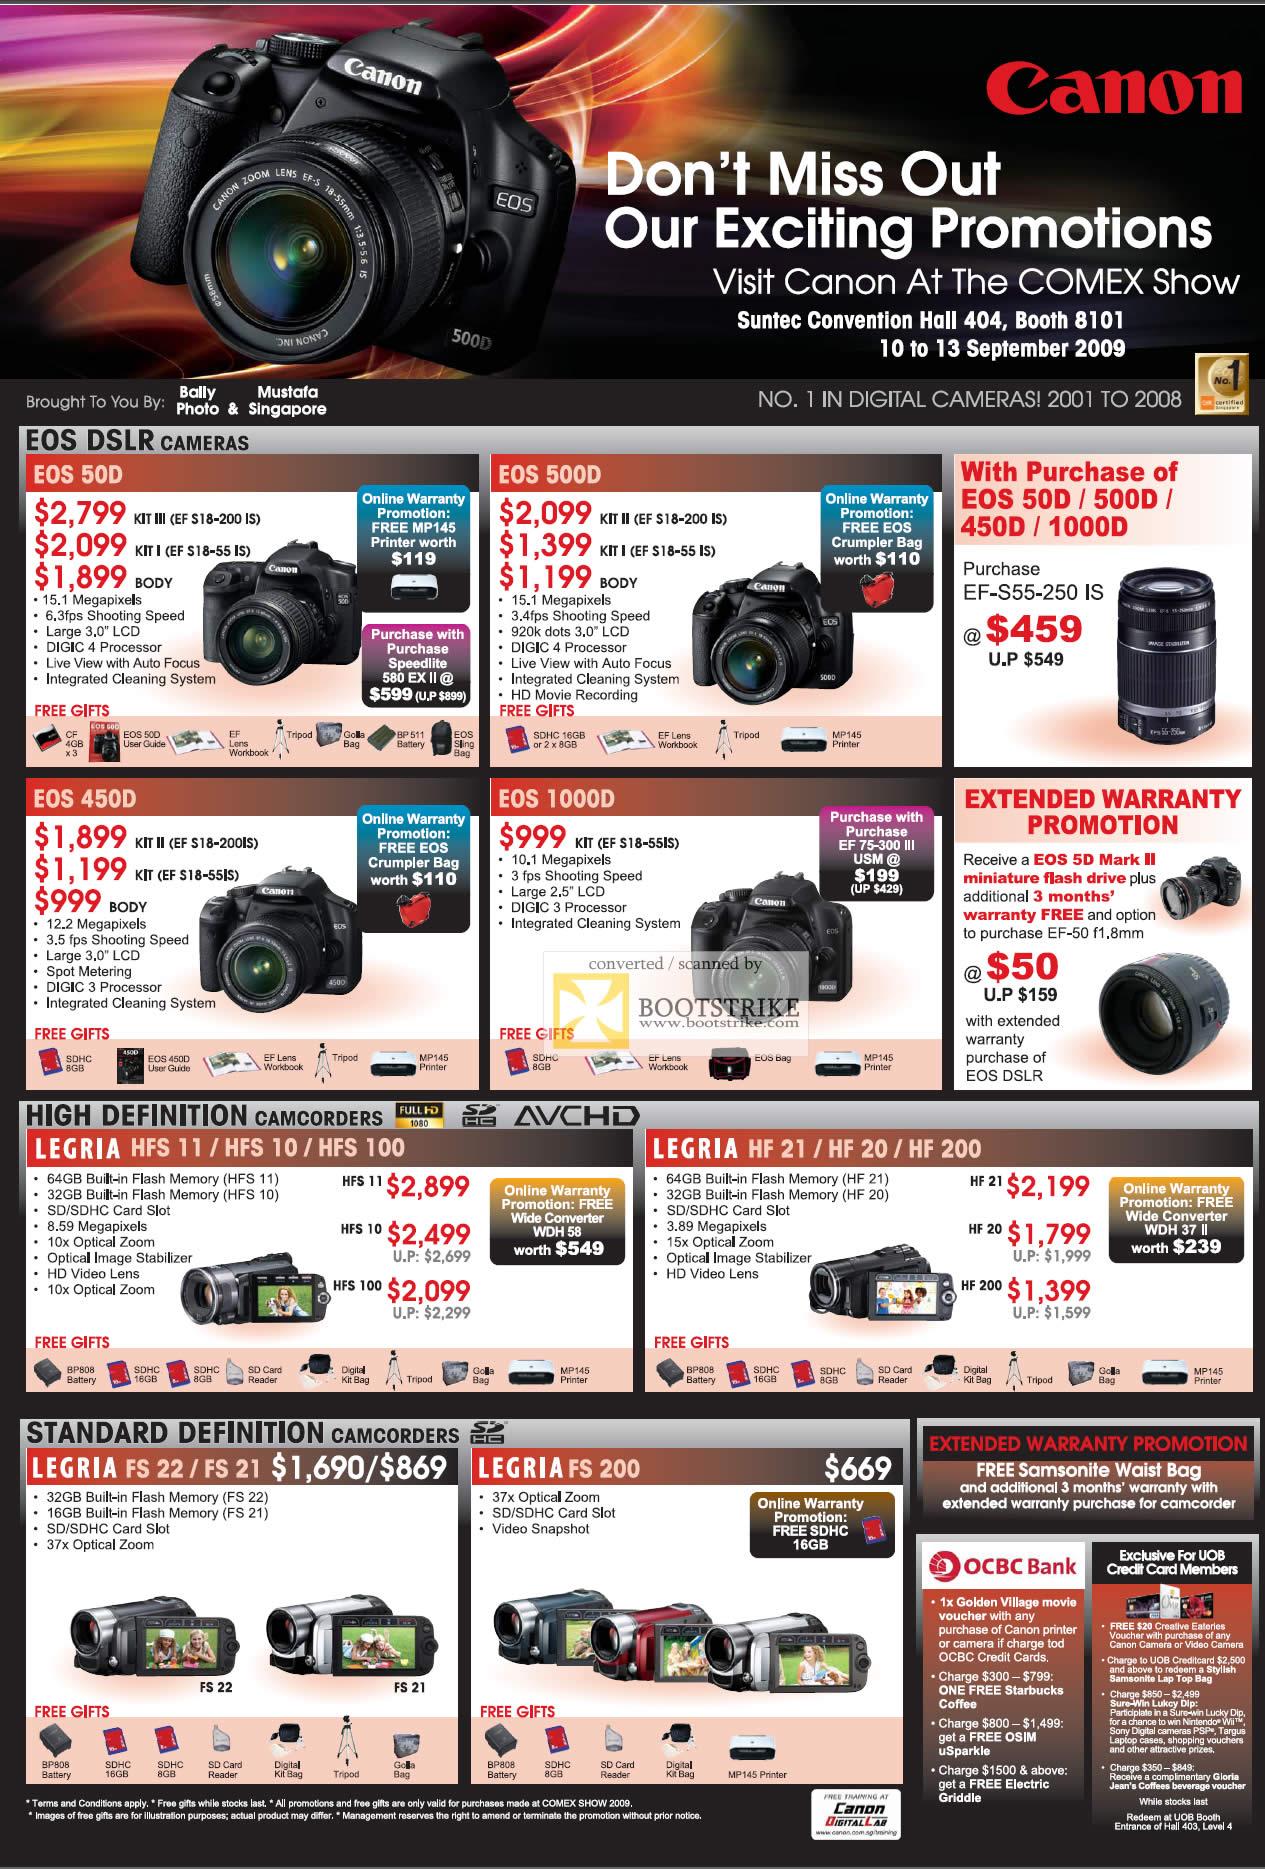 Comex 2009 price list image brochure of Canon EOS DSLR 50D 500D 450D 1000D Cameras HD Camcorders Legria